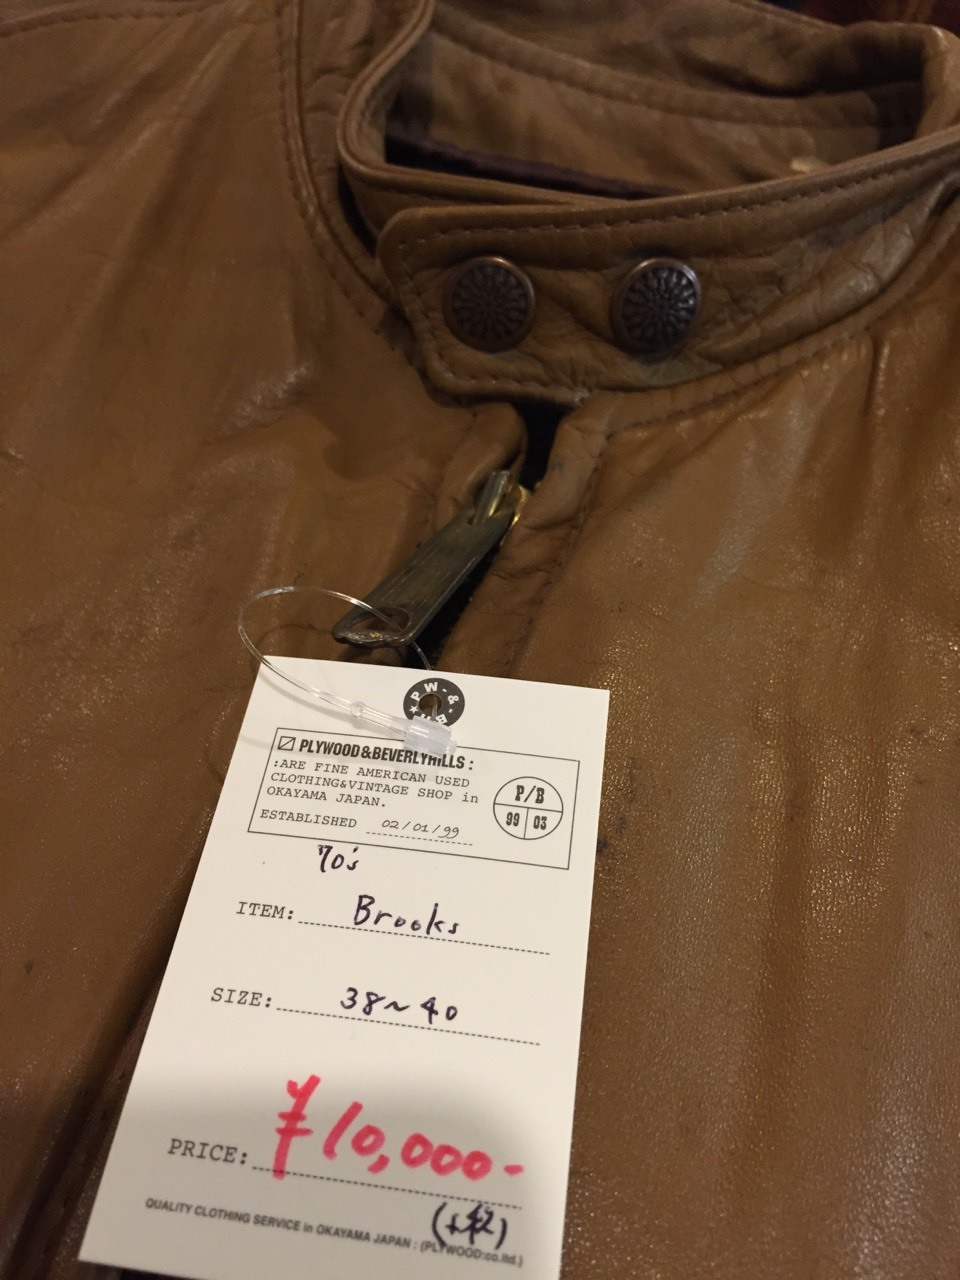 leatherjacket & スタジャン_a0108963_00563983.jpg